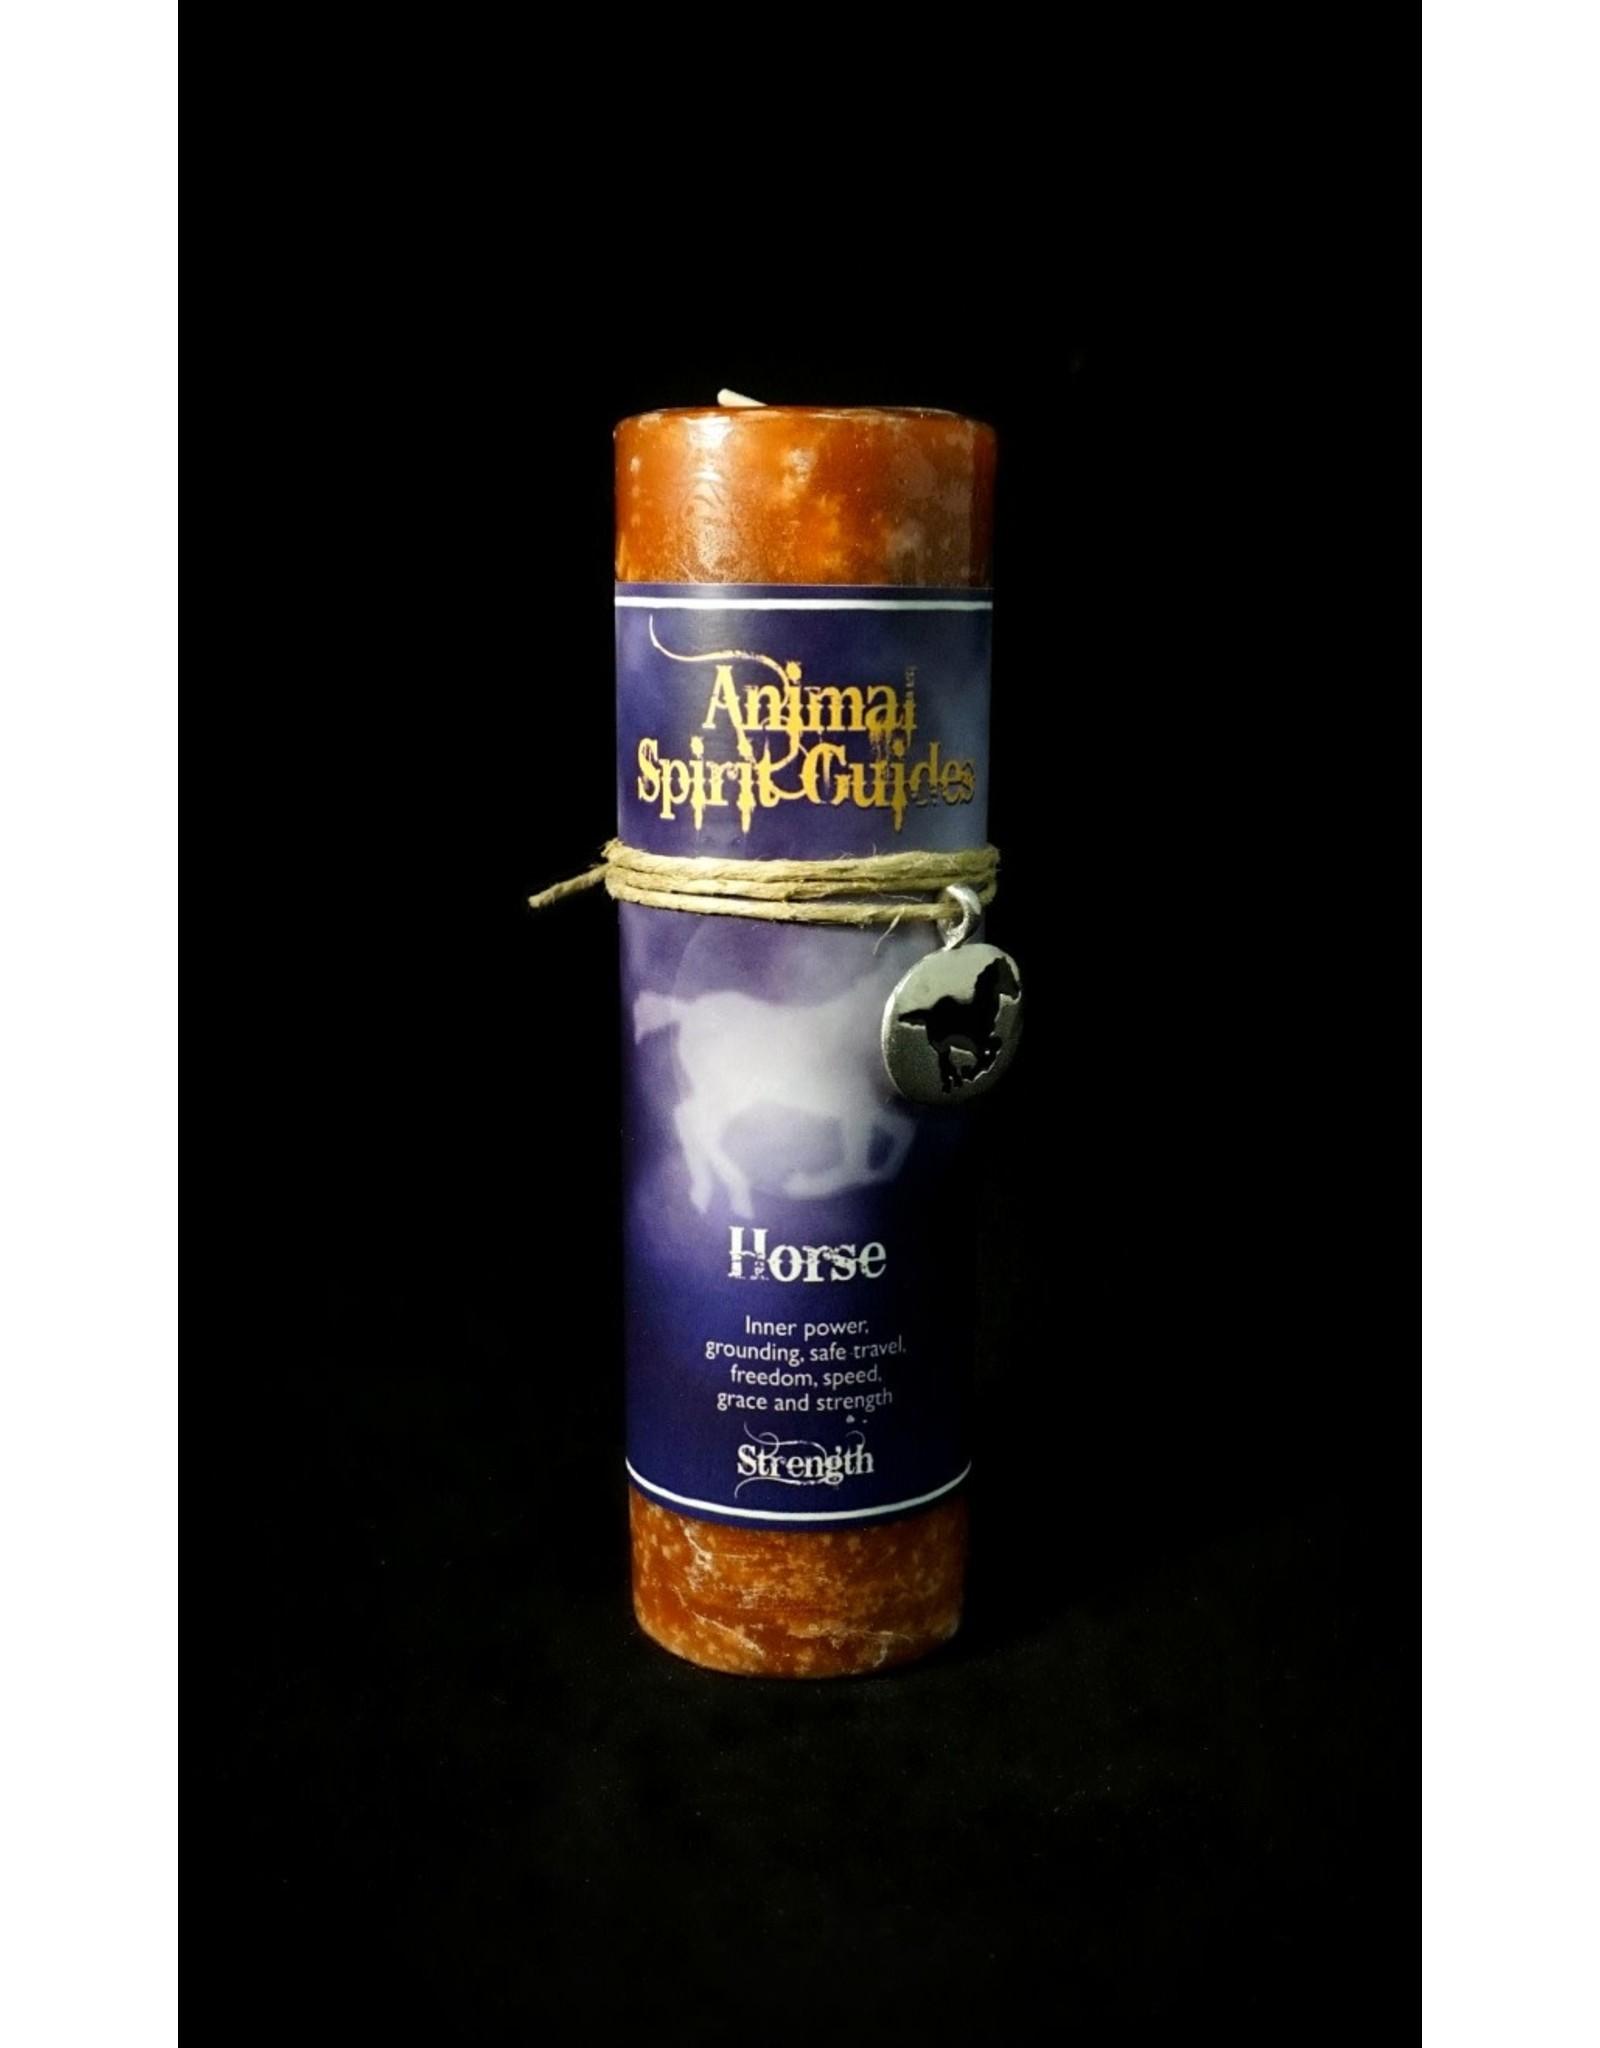 Animal Spirit Guide Pewter Pendant Candle - Horse